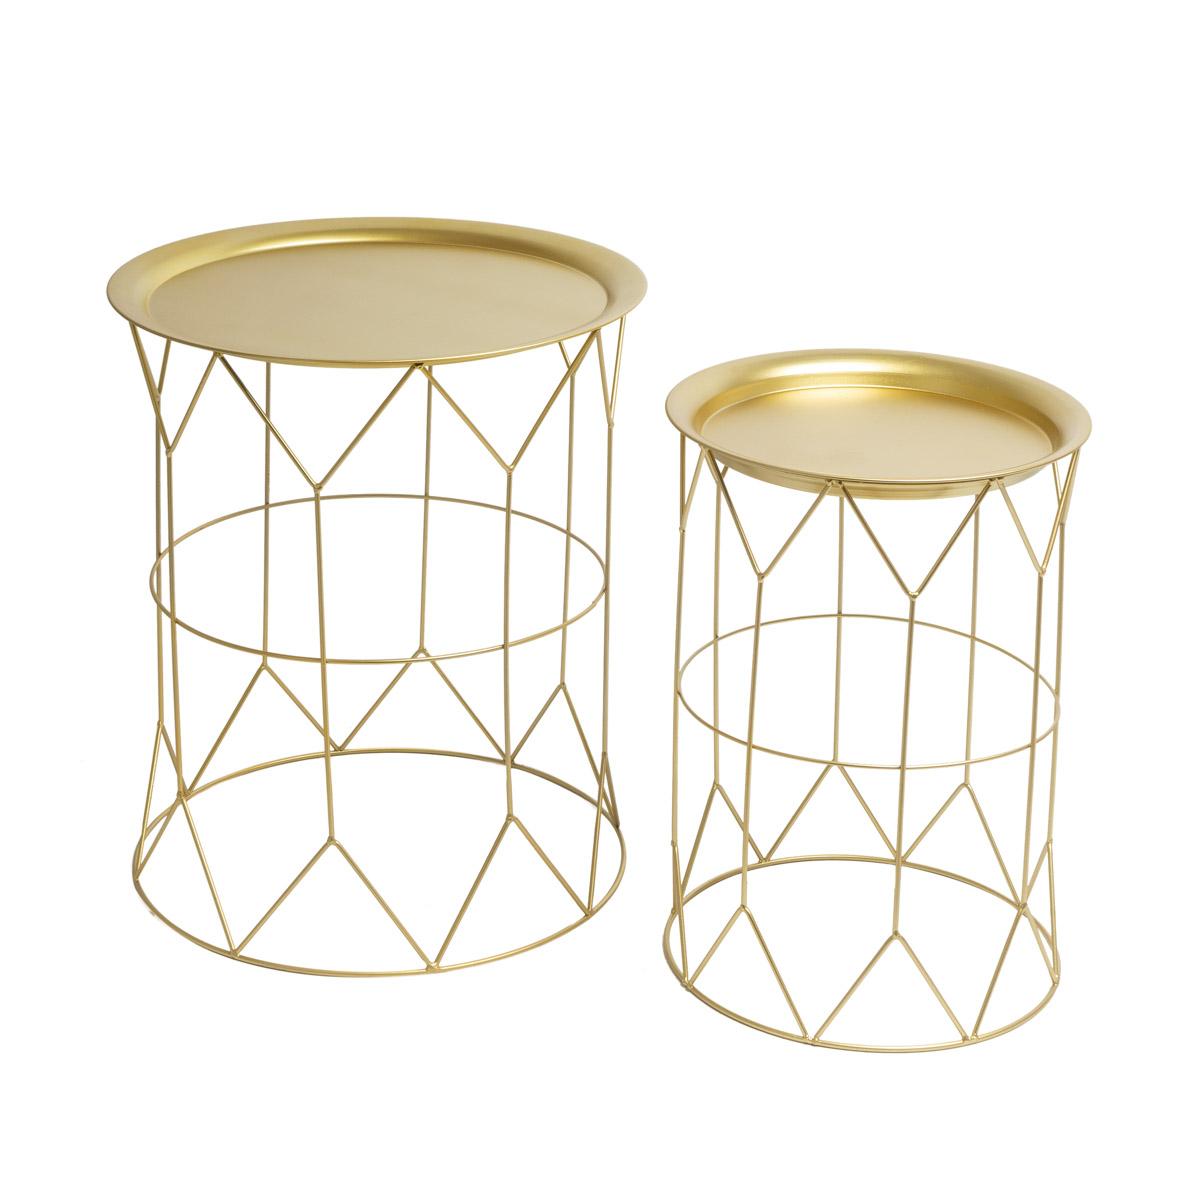 2 Tables set, Mr Smith metal, color golden